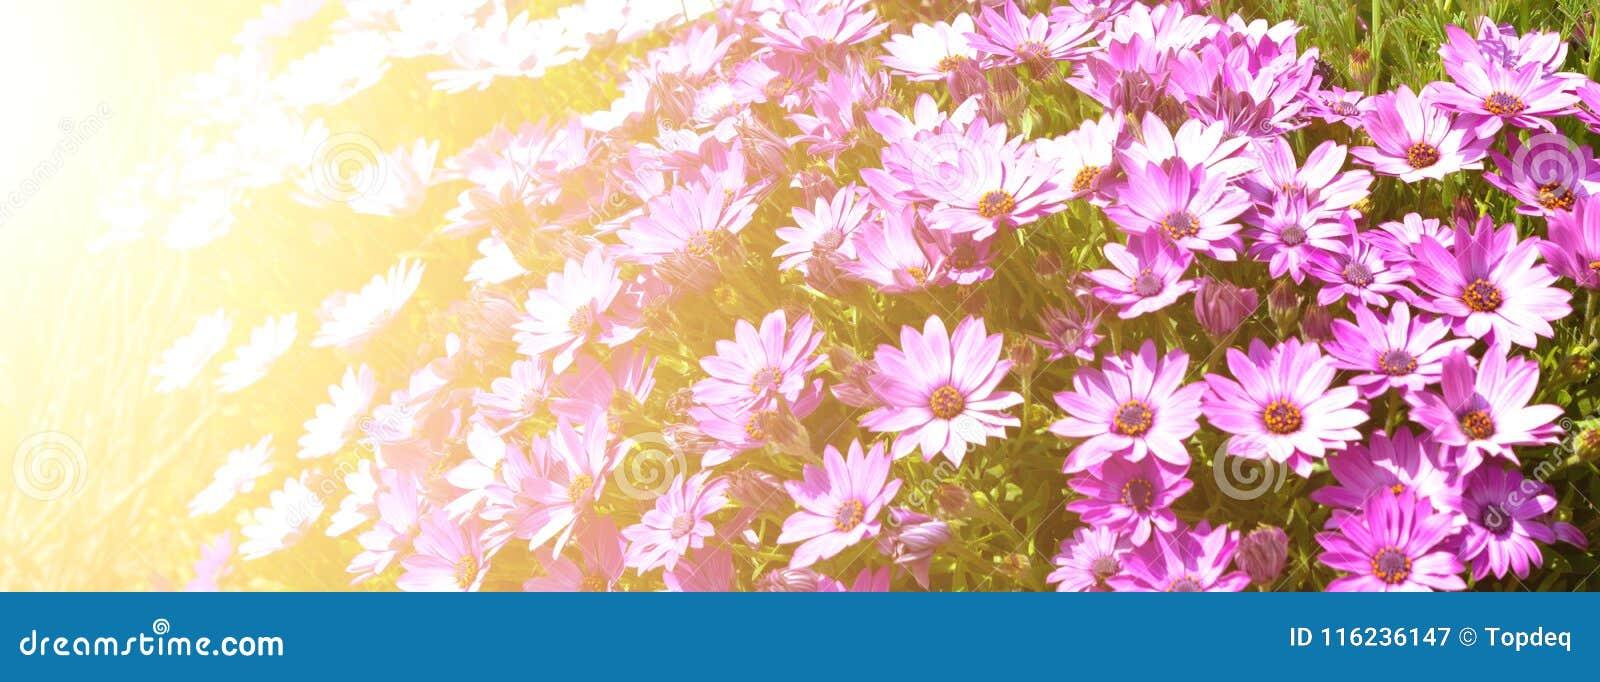 Canteiro de flores brilhante